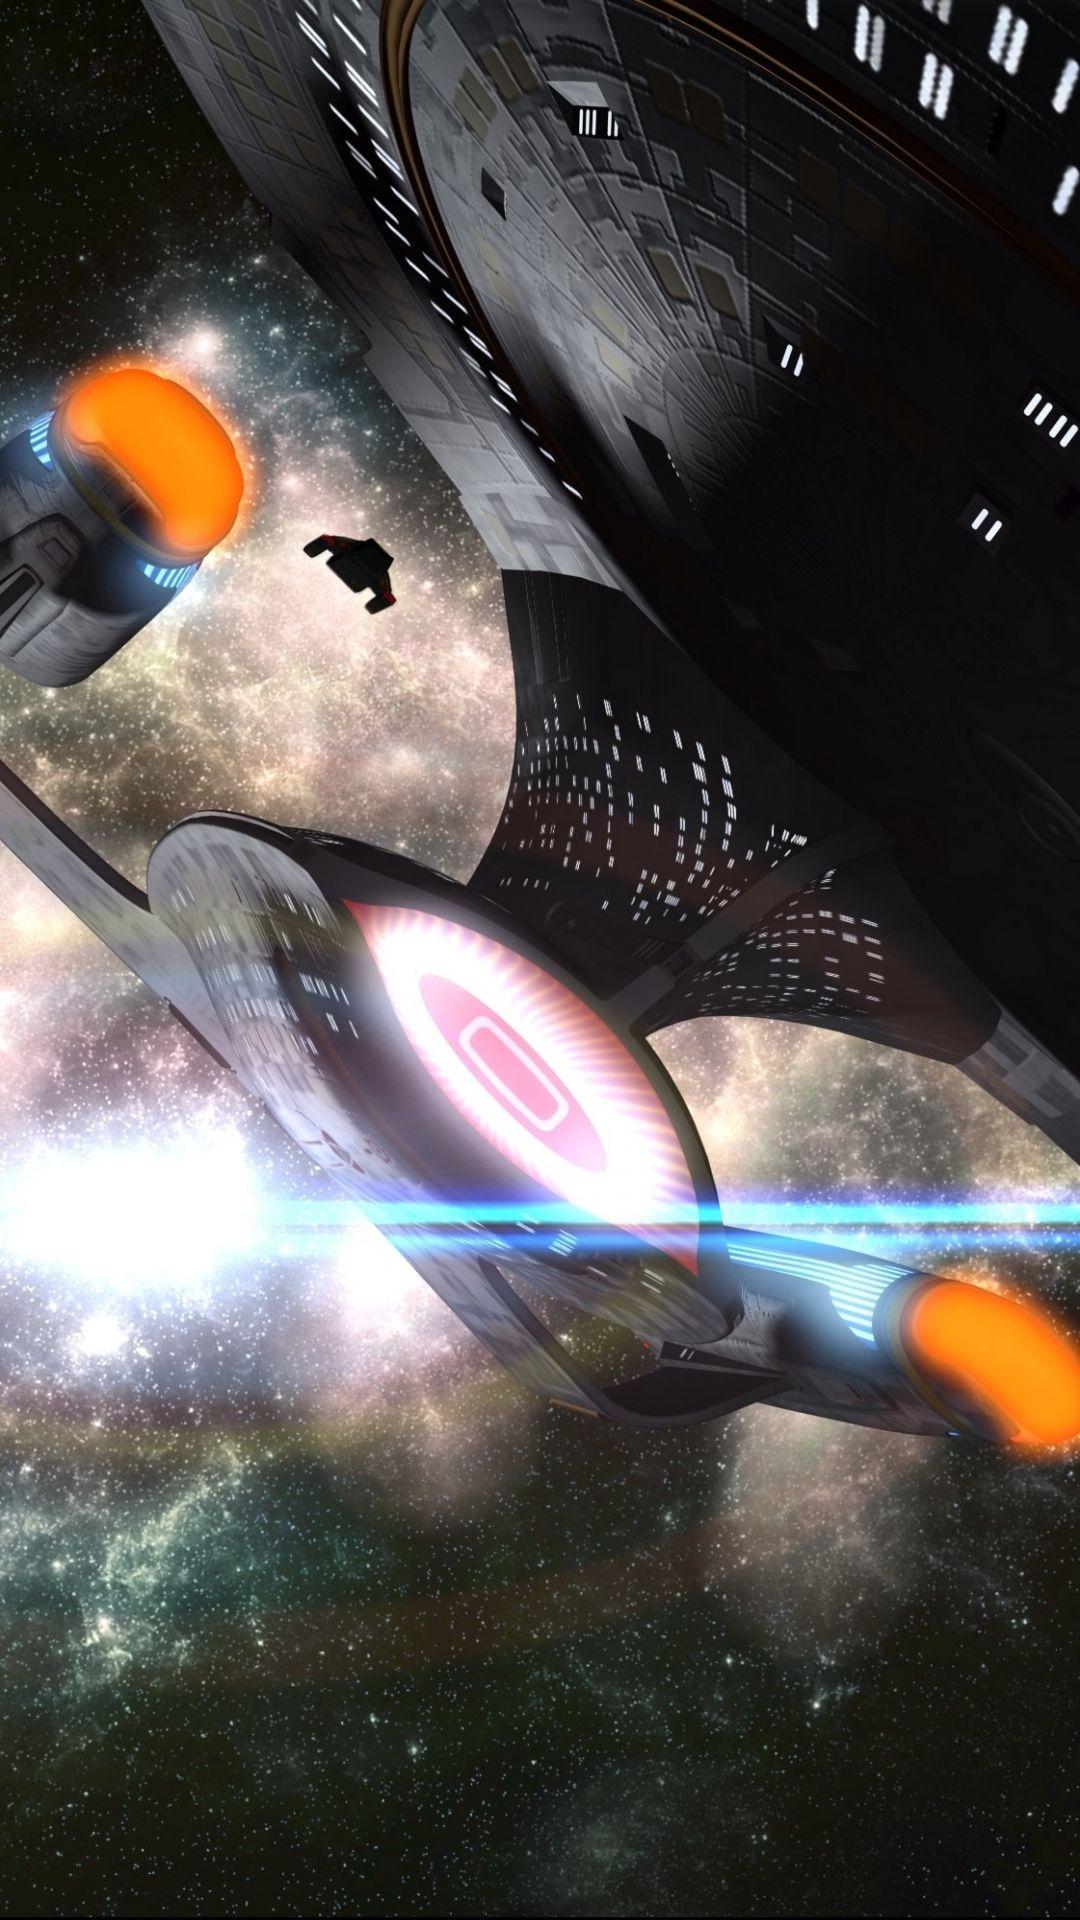 Star Trek Enterprise Smartphone Wallpapers   Wallpaper Cave